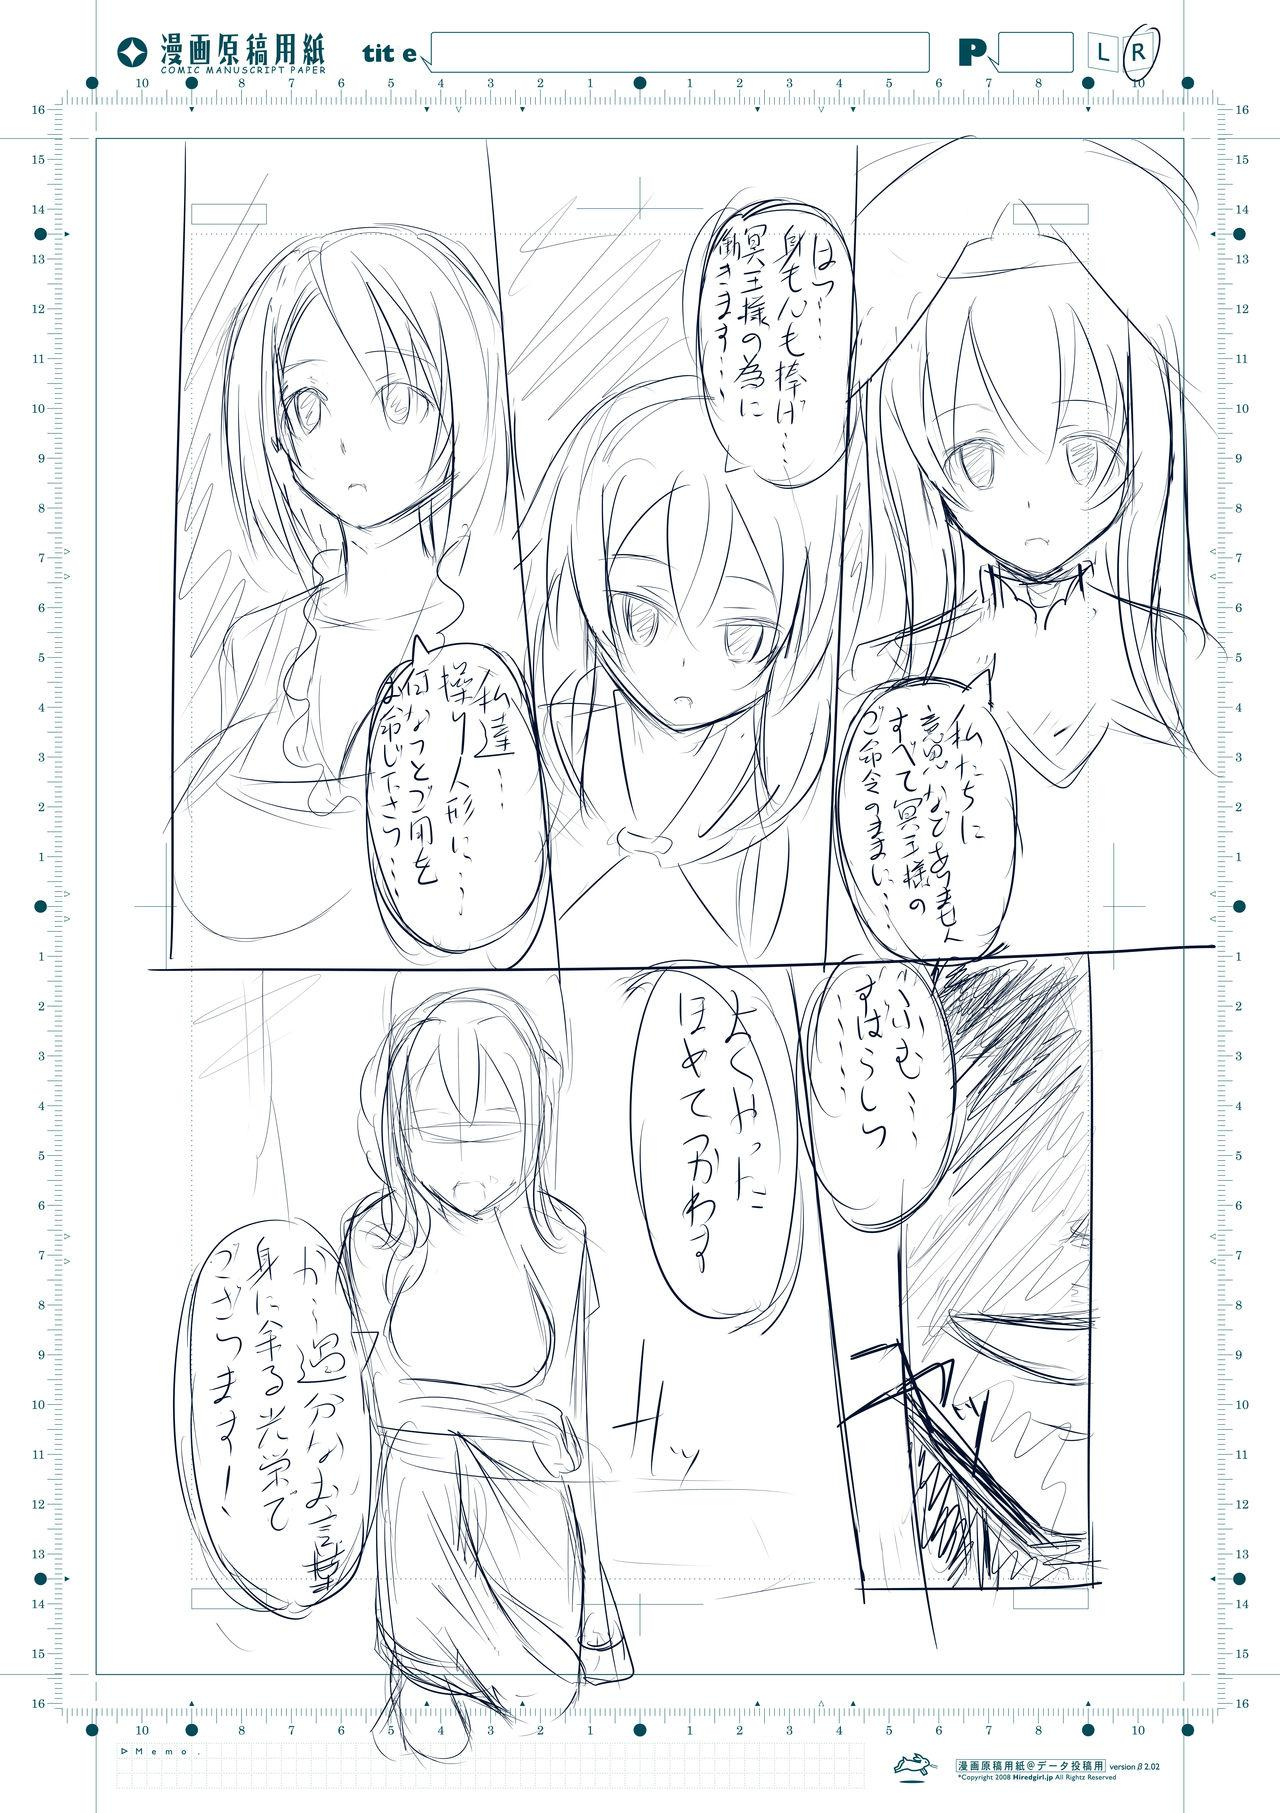 Goblin Slayer Sennou Manga 20